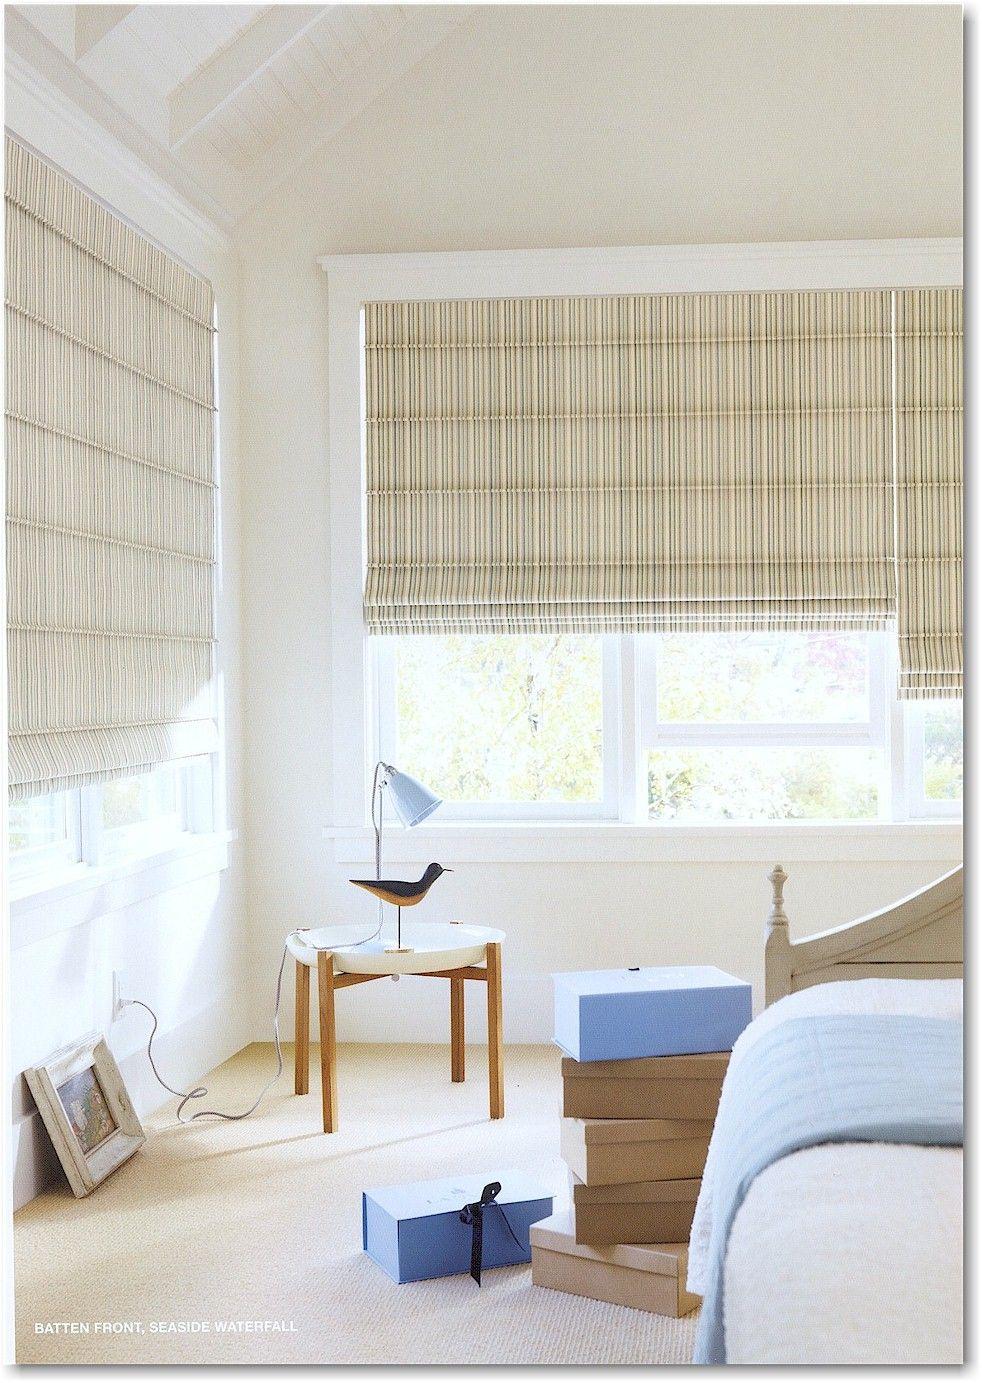 Hunter Douglas Design Studio Roman Shades In Batten Front Style Window Treatments Bedroom Kitchen Renovation Cost Roman Shades